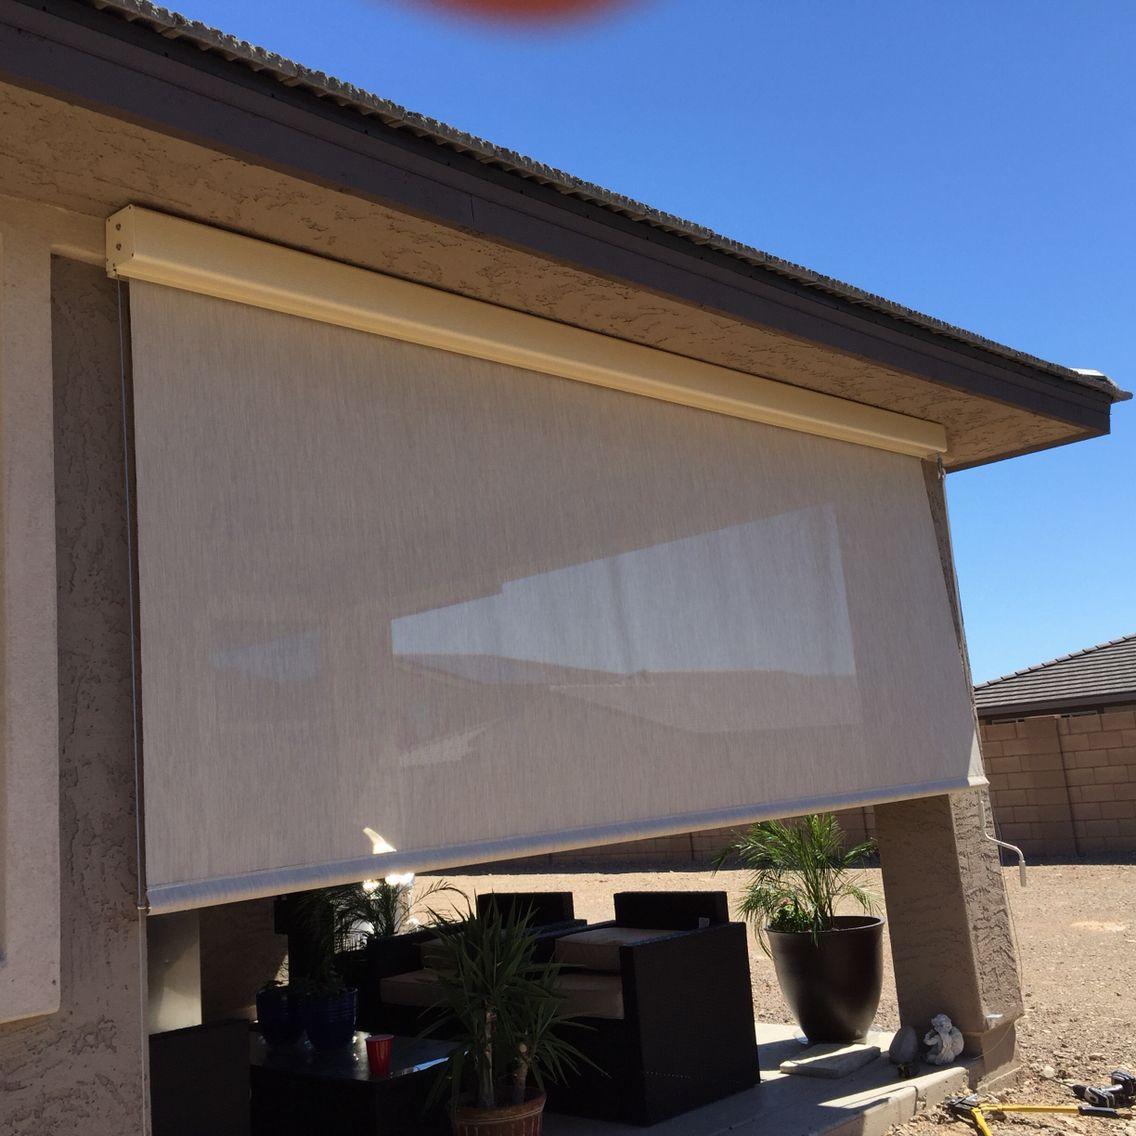 Roll Down Shades Crank System Phoenix,AZ | Patio Roll Down Shades ...